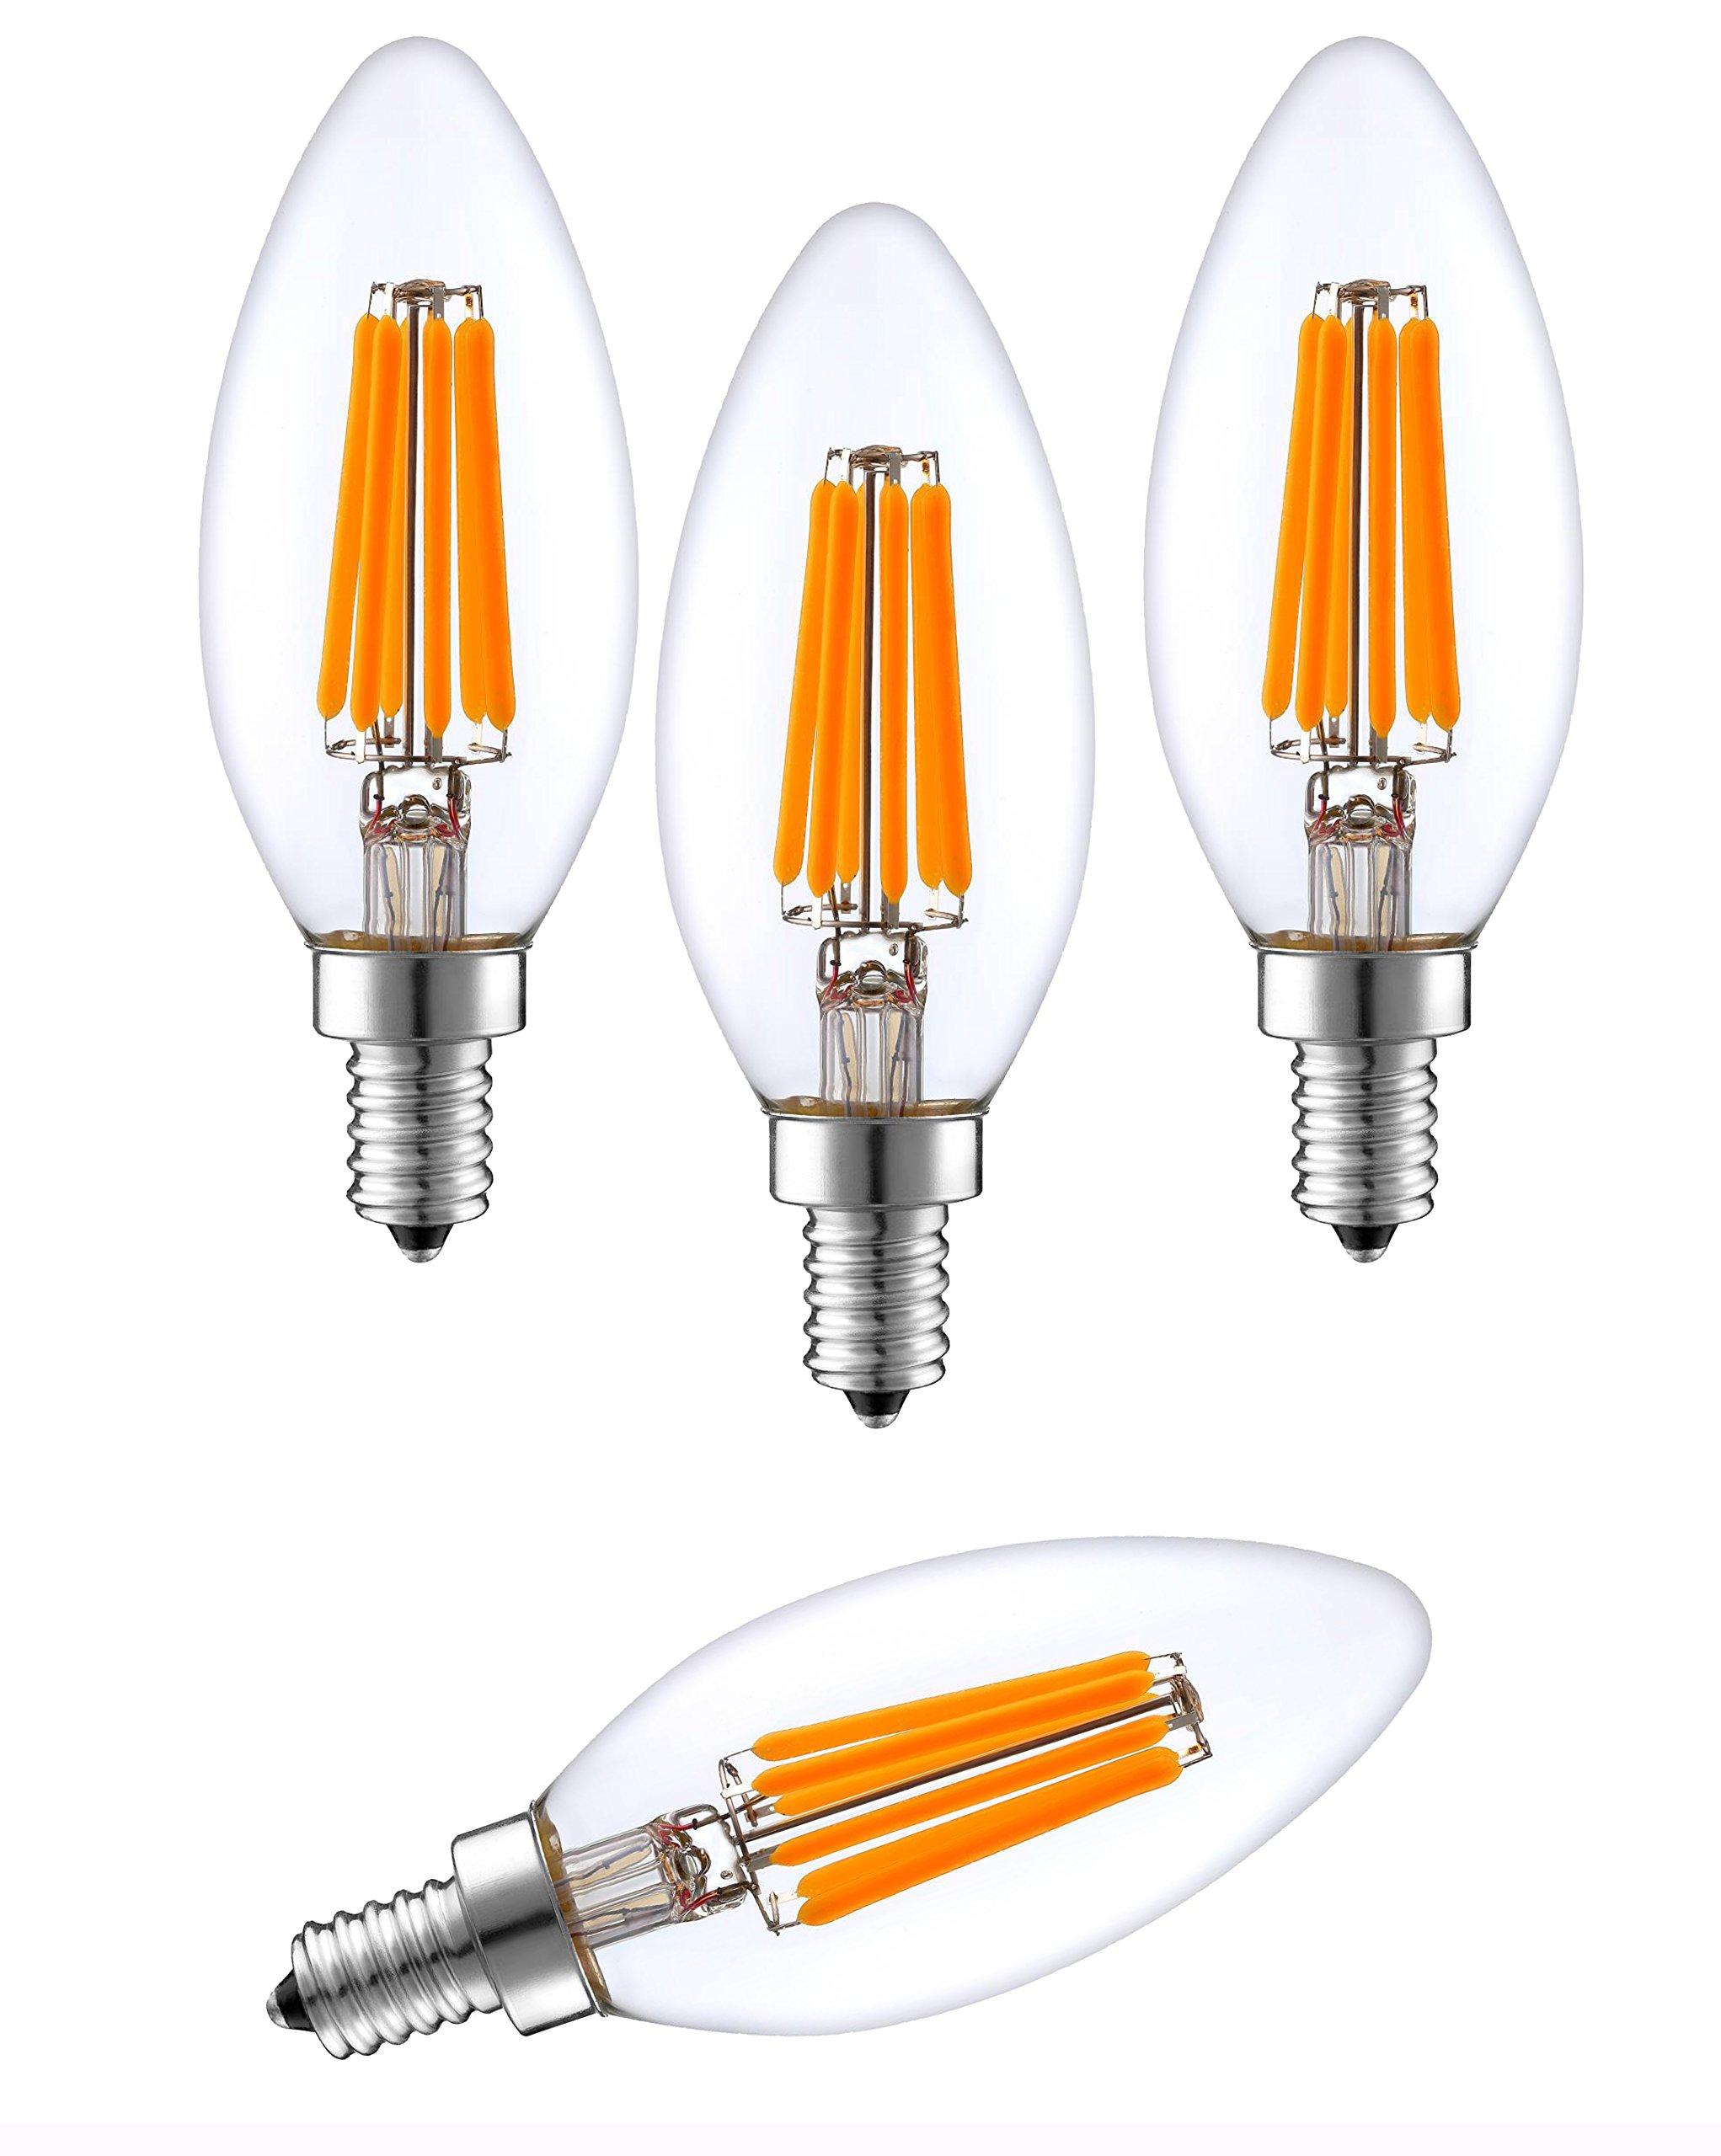 SleekLighting 6-Watt E12 LED Filament Candelabra Light Bulb - Dimmable (60W Incandescent Replacement) - Warm White 2700K Decorative Chandelier Bulb - E12 Base 4pack (Torpedo Clear)